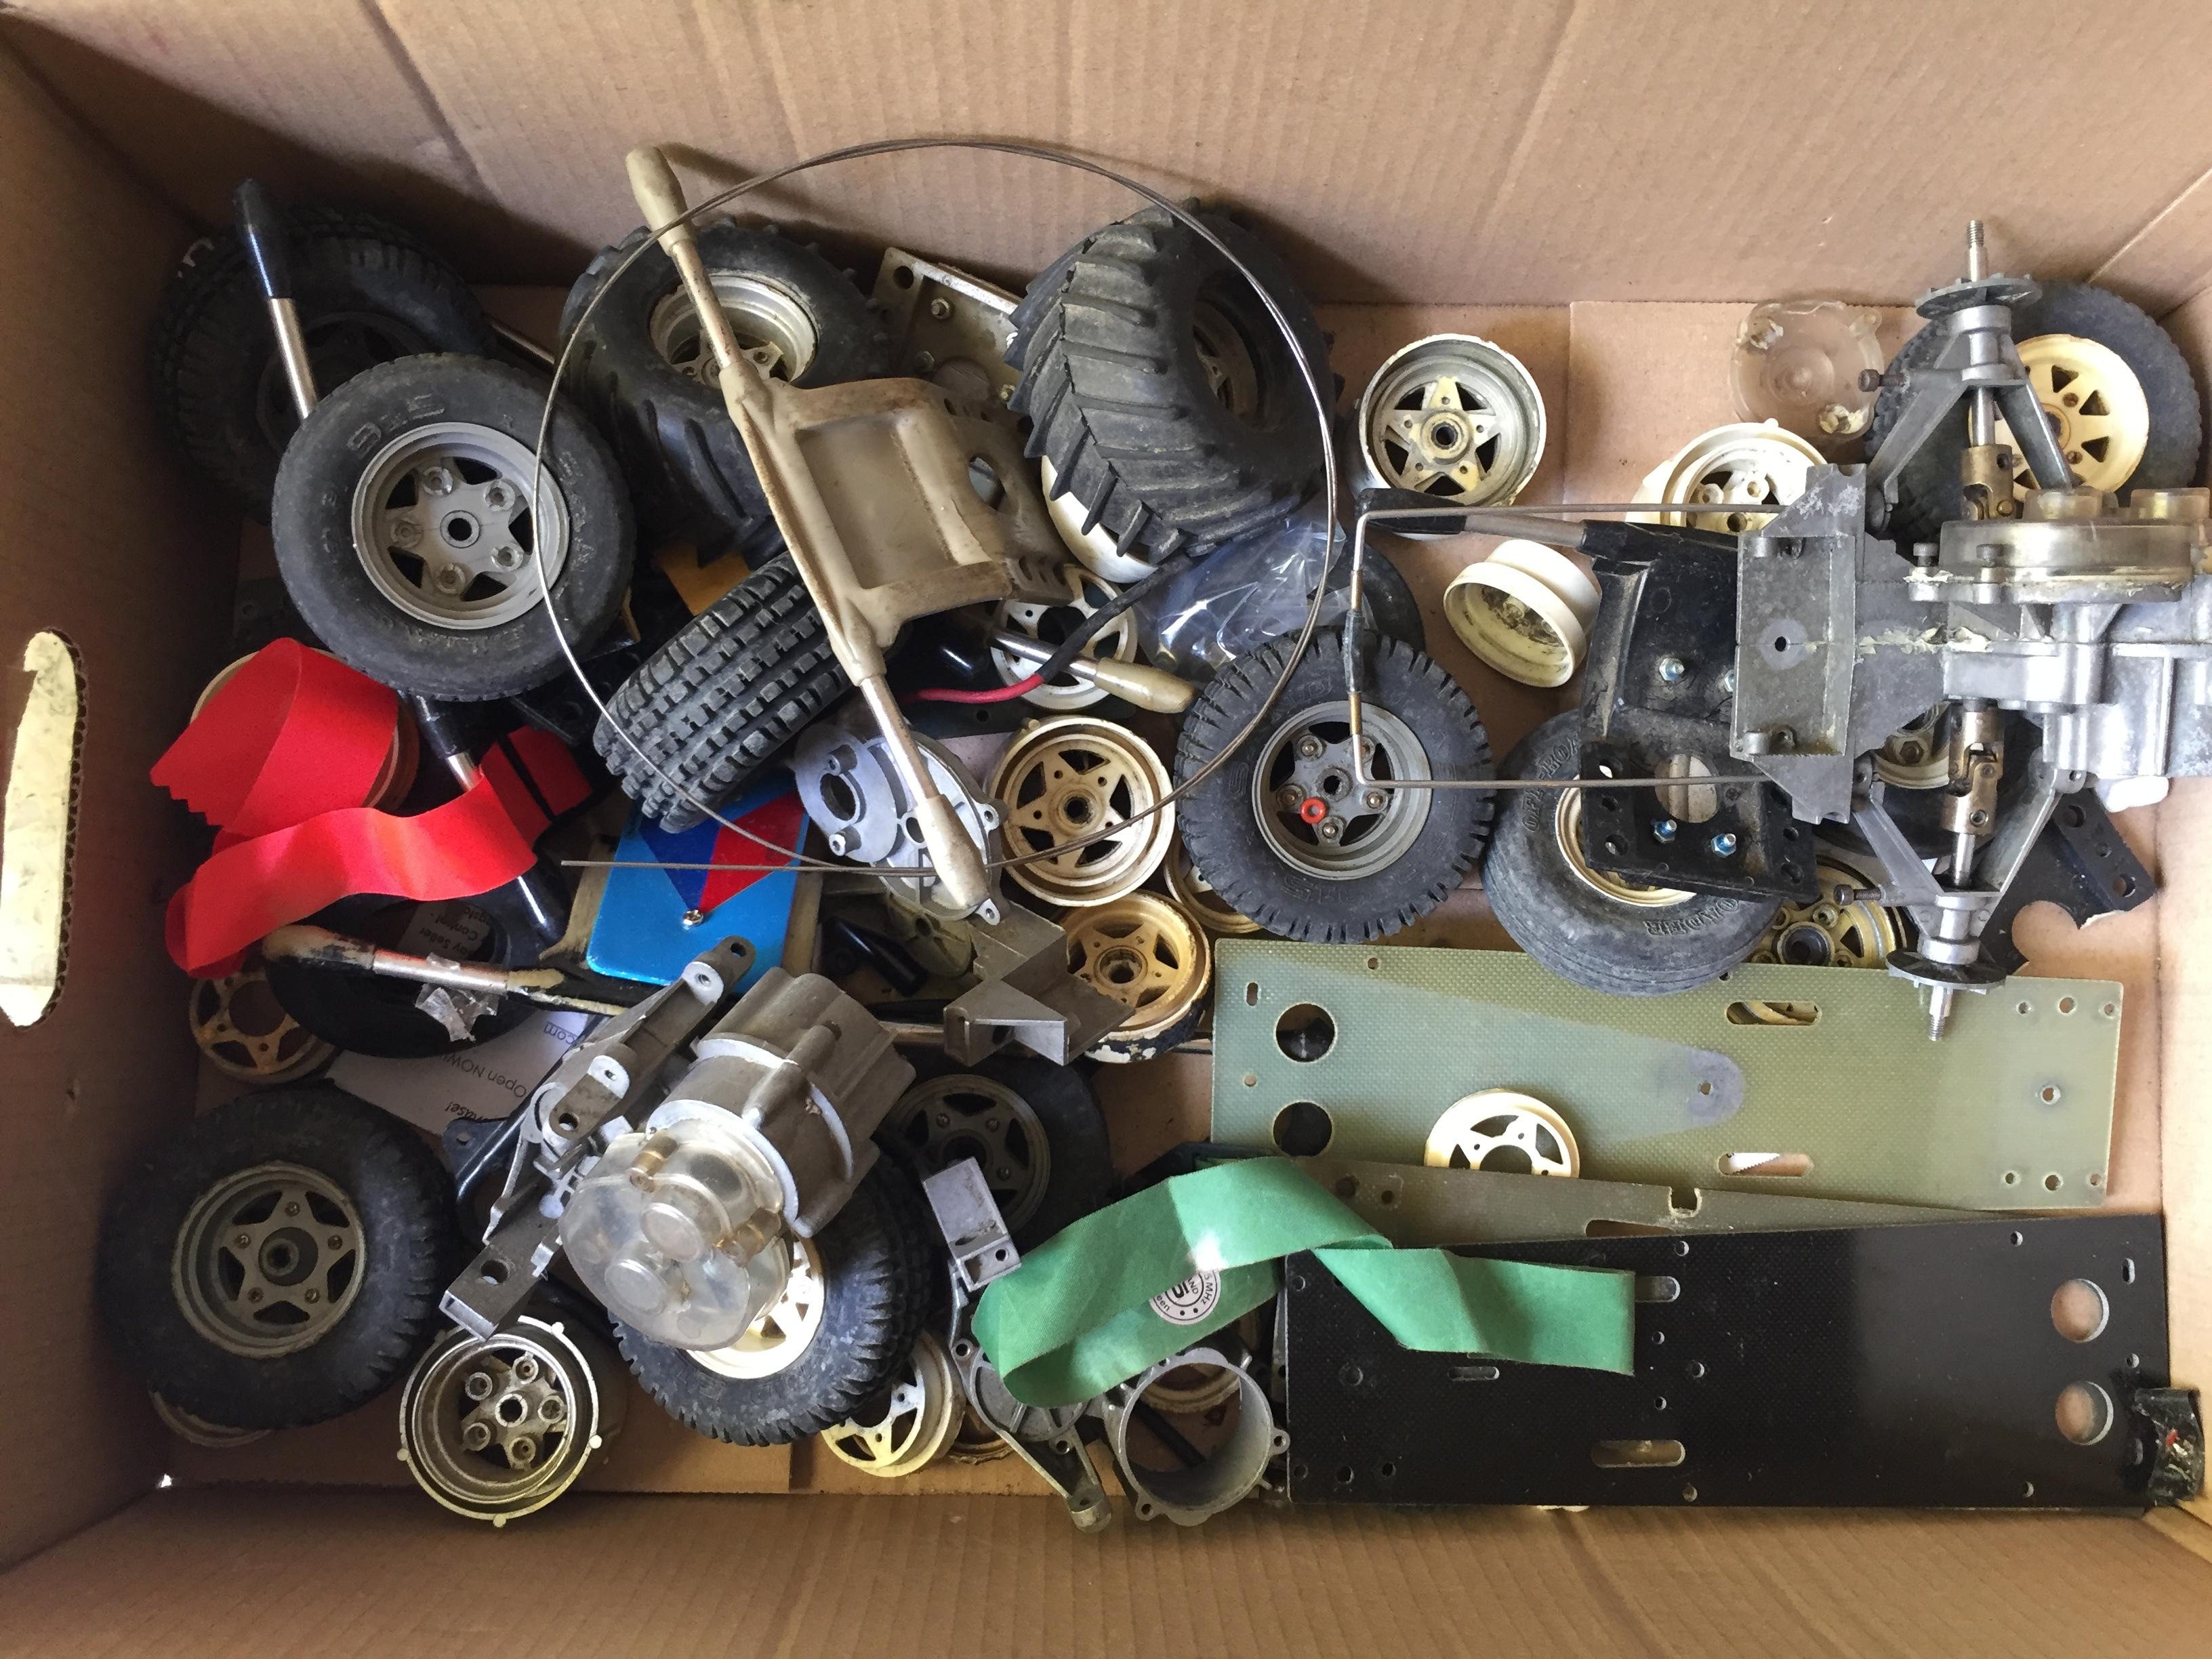 Used Car Auctions >> tamiya sand scorcher used parts - Tamiya RC & Radio Control Cars